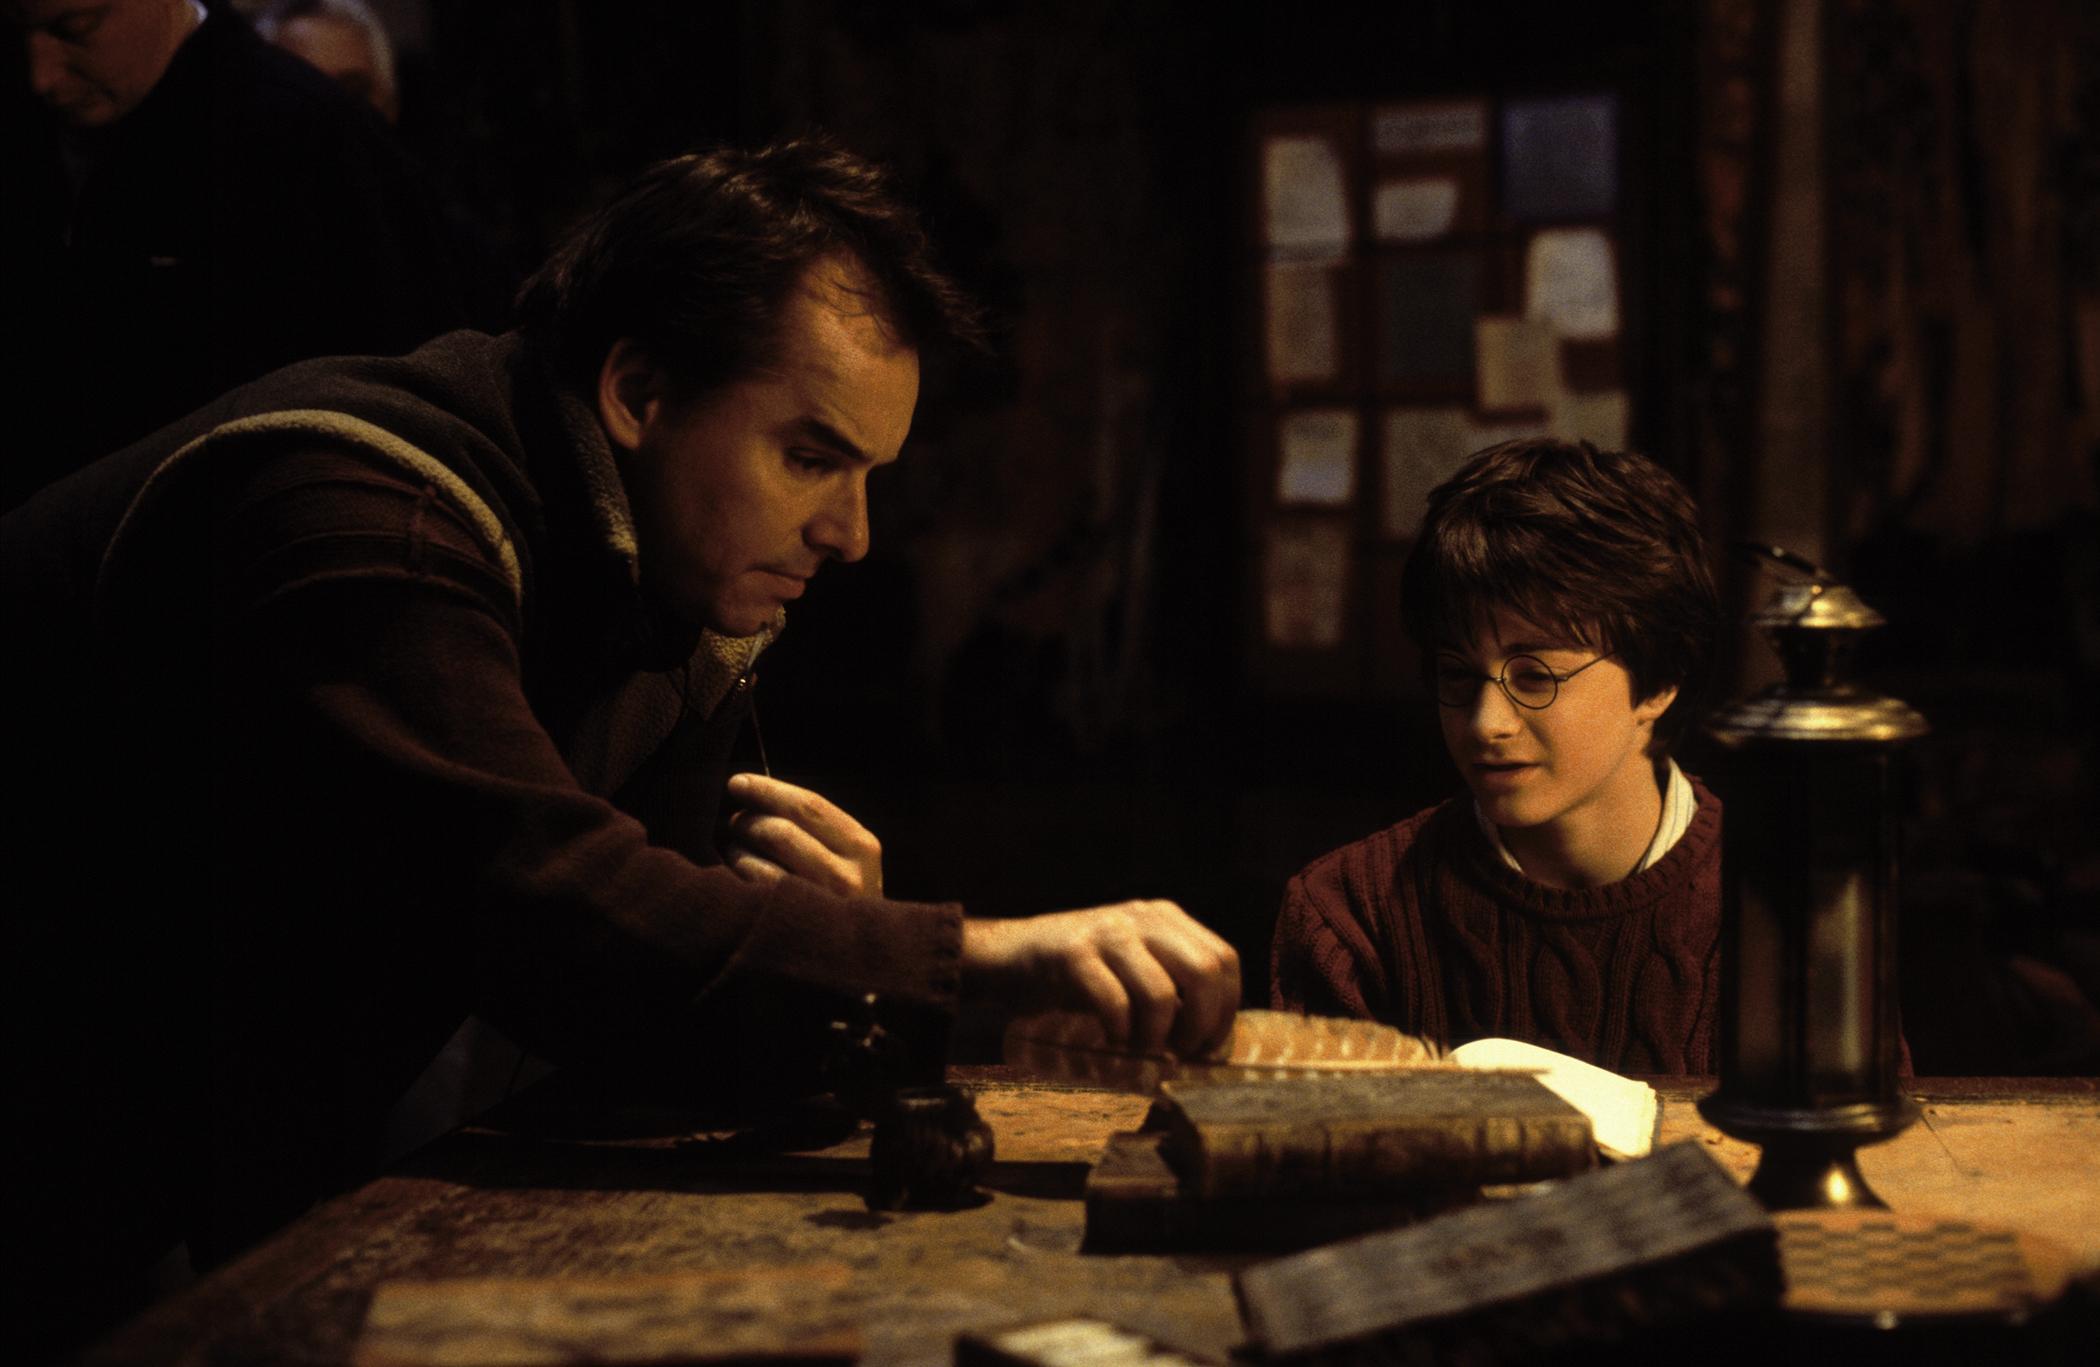 Chris-Columbus-Daniel-Radcliffe-on-set-Harry-Potter-The-Chamber-of-Secrets-camera